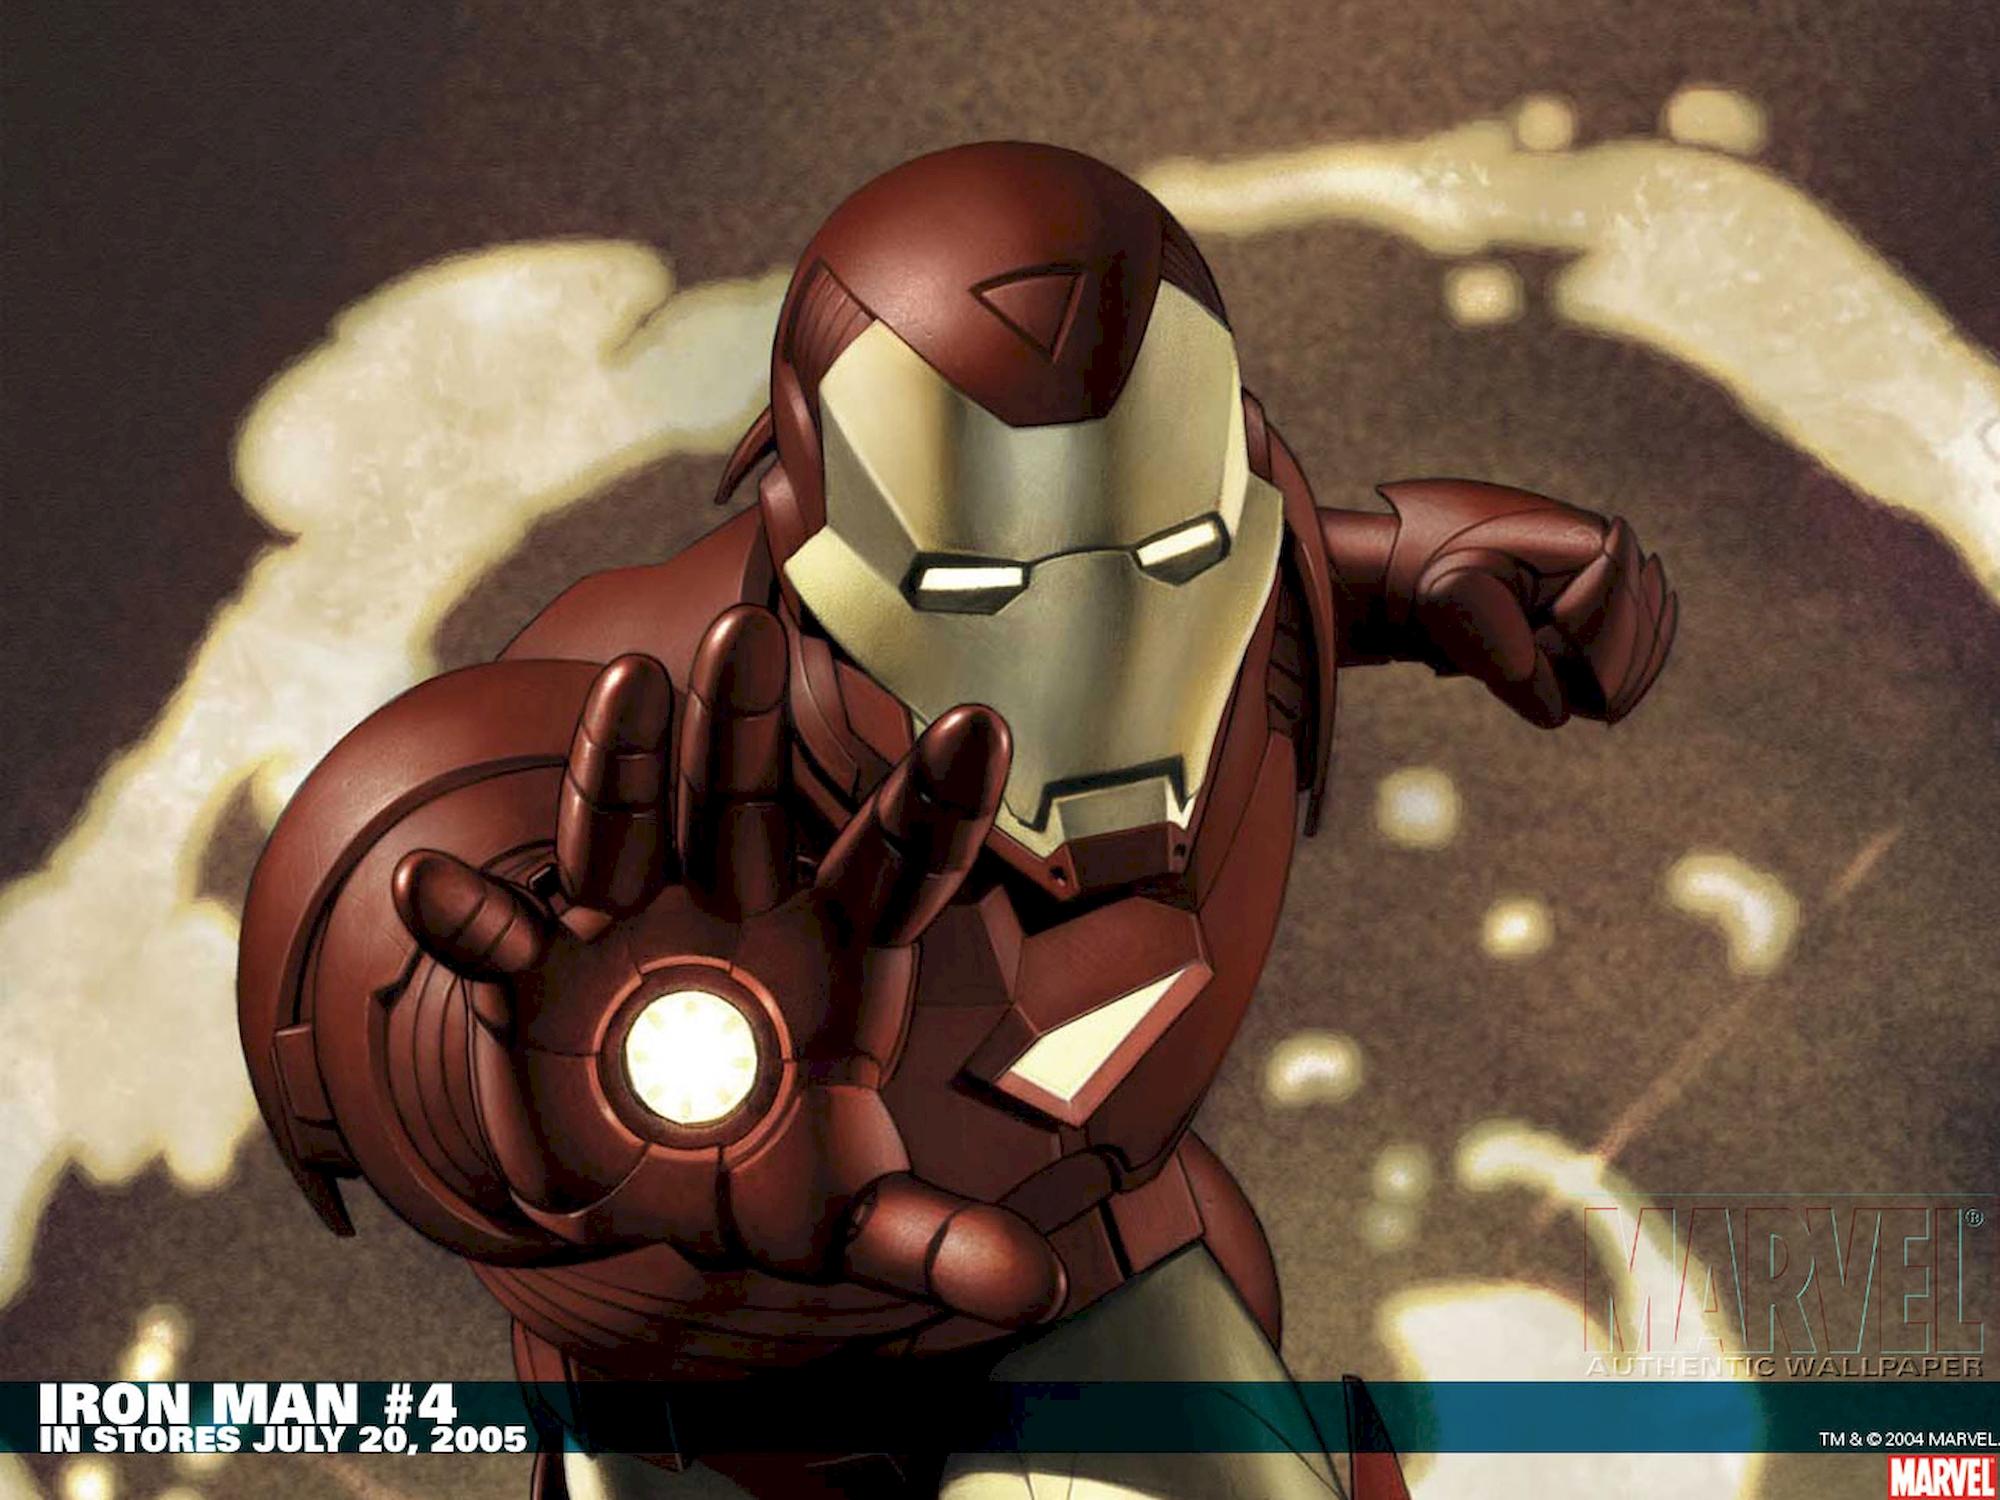 iron-man-4-heros-marvel